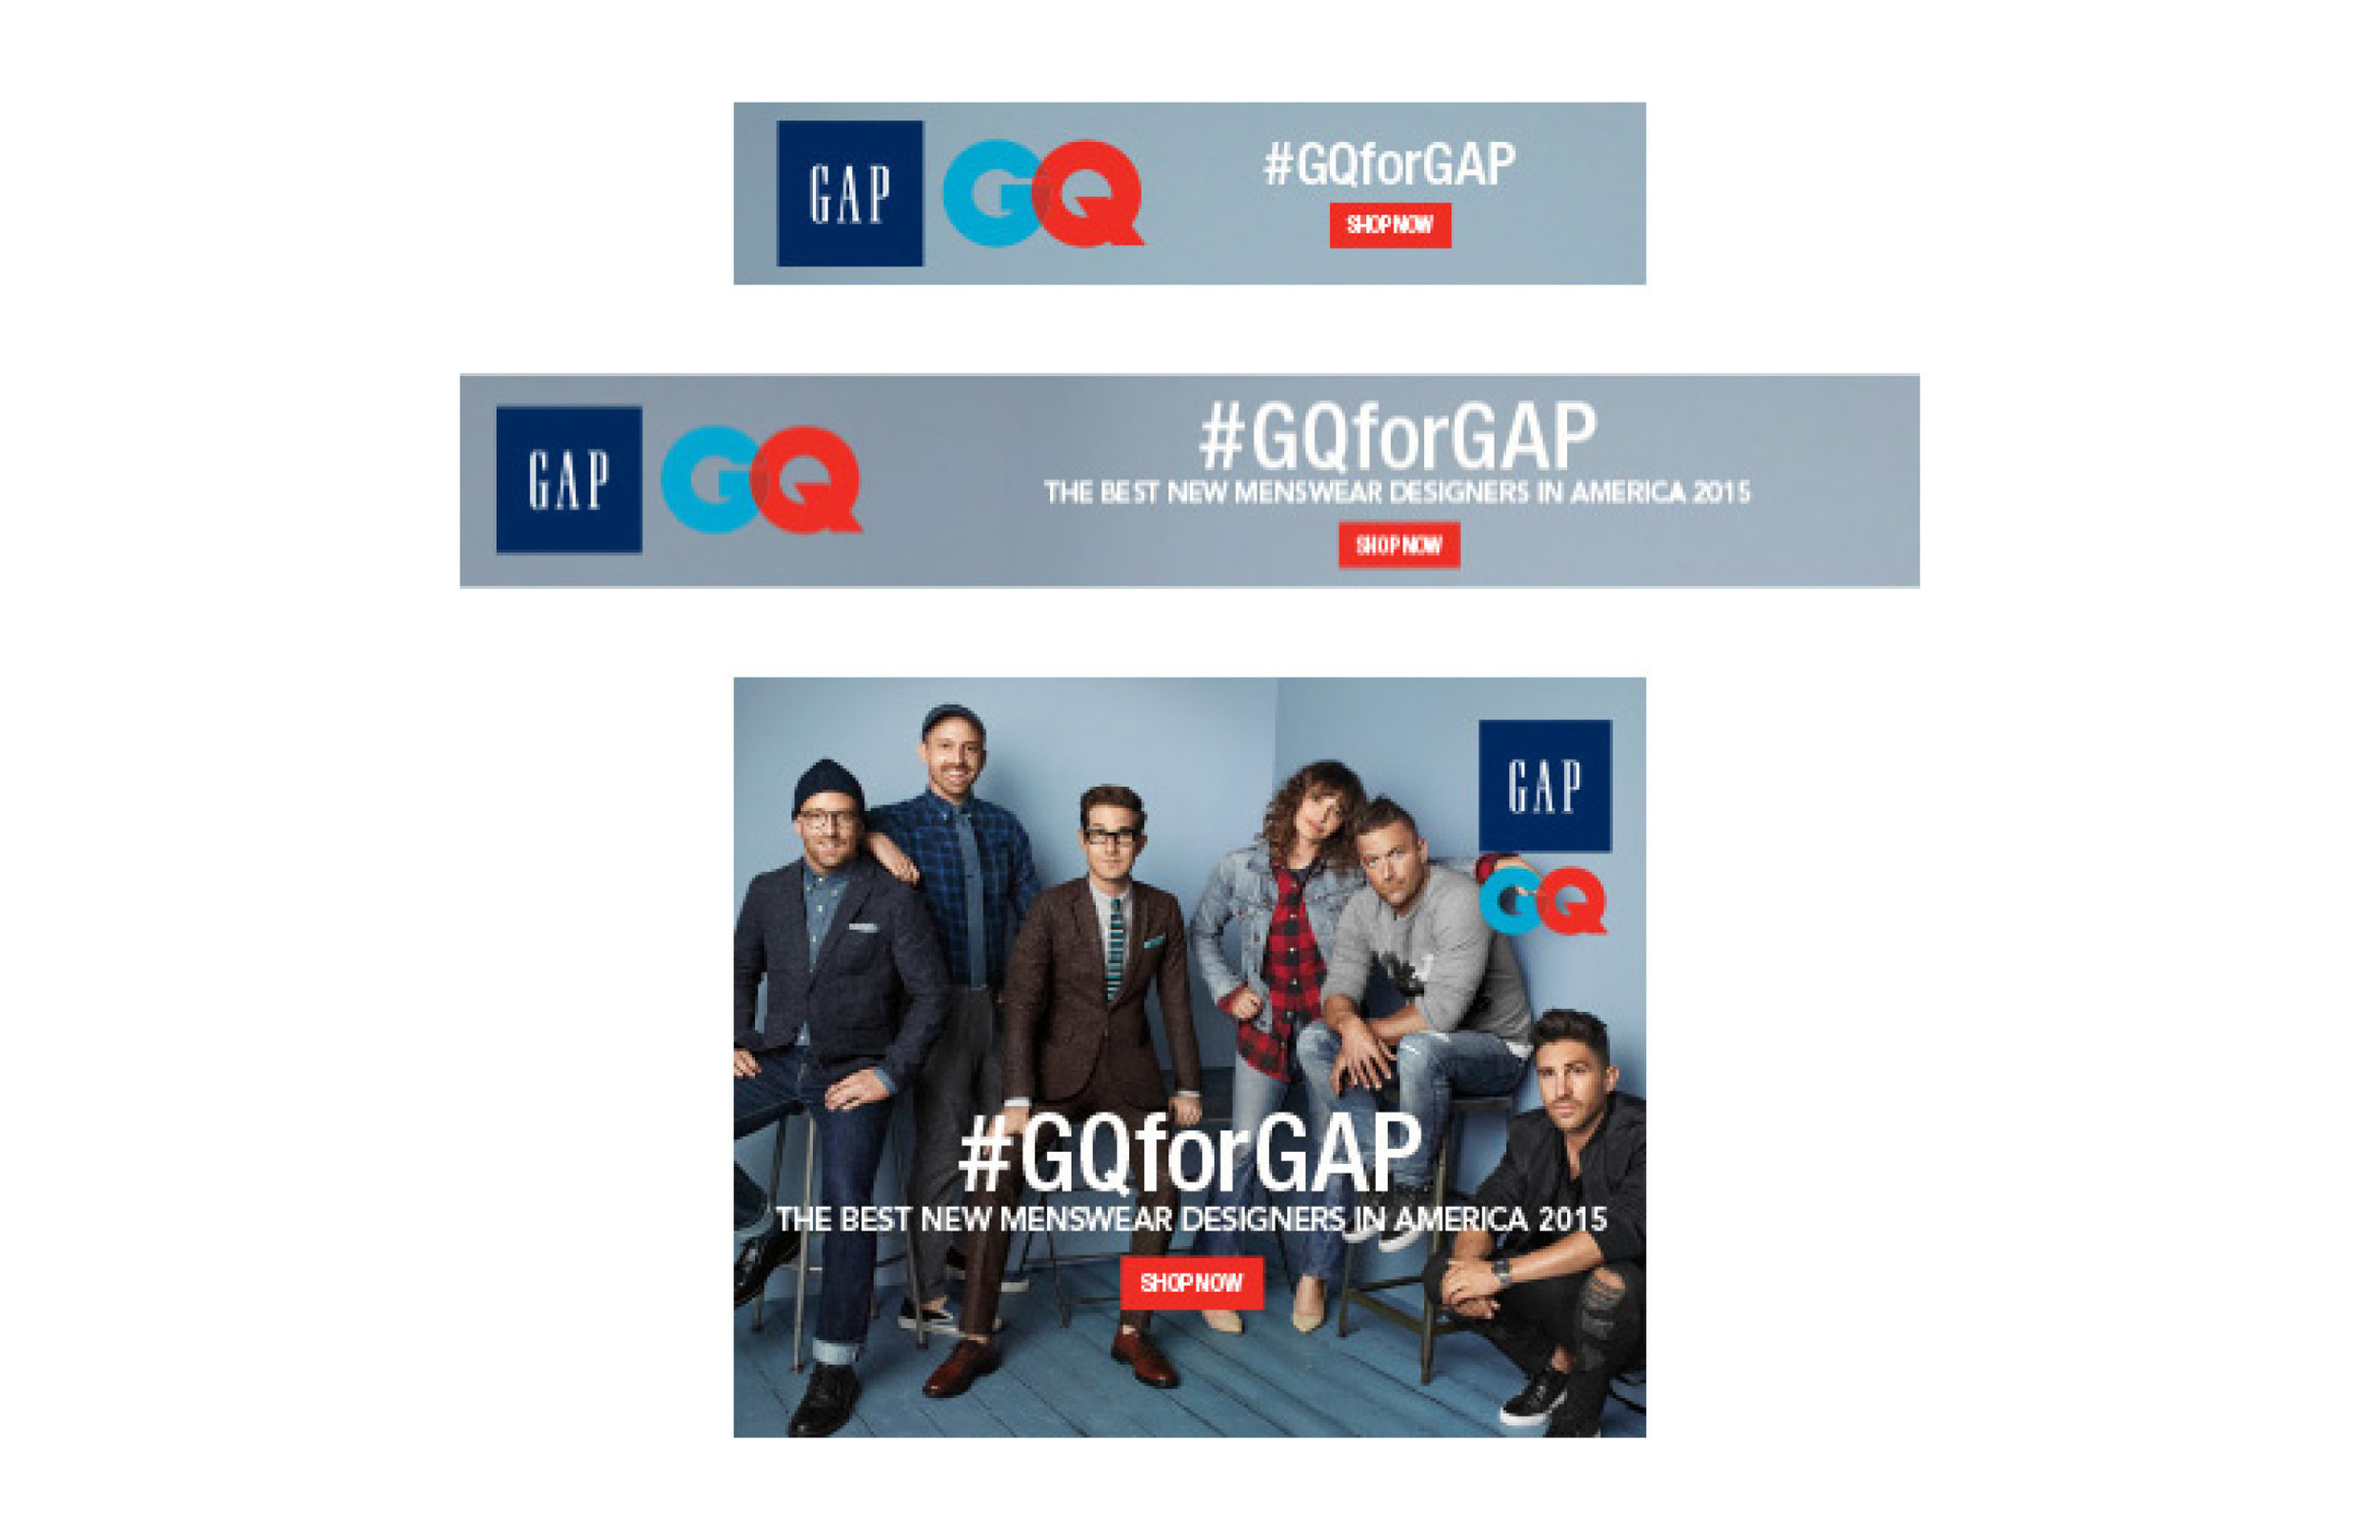 GAP_photos16.jpg